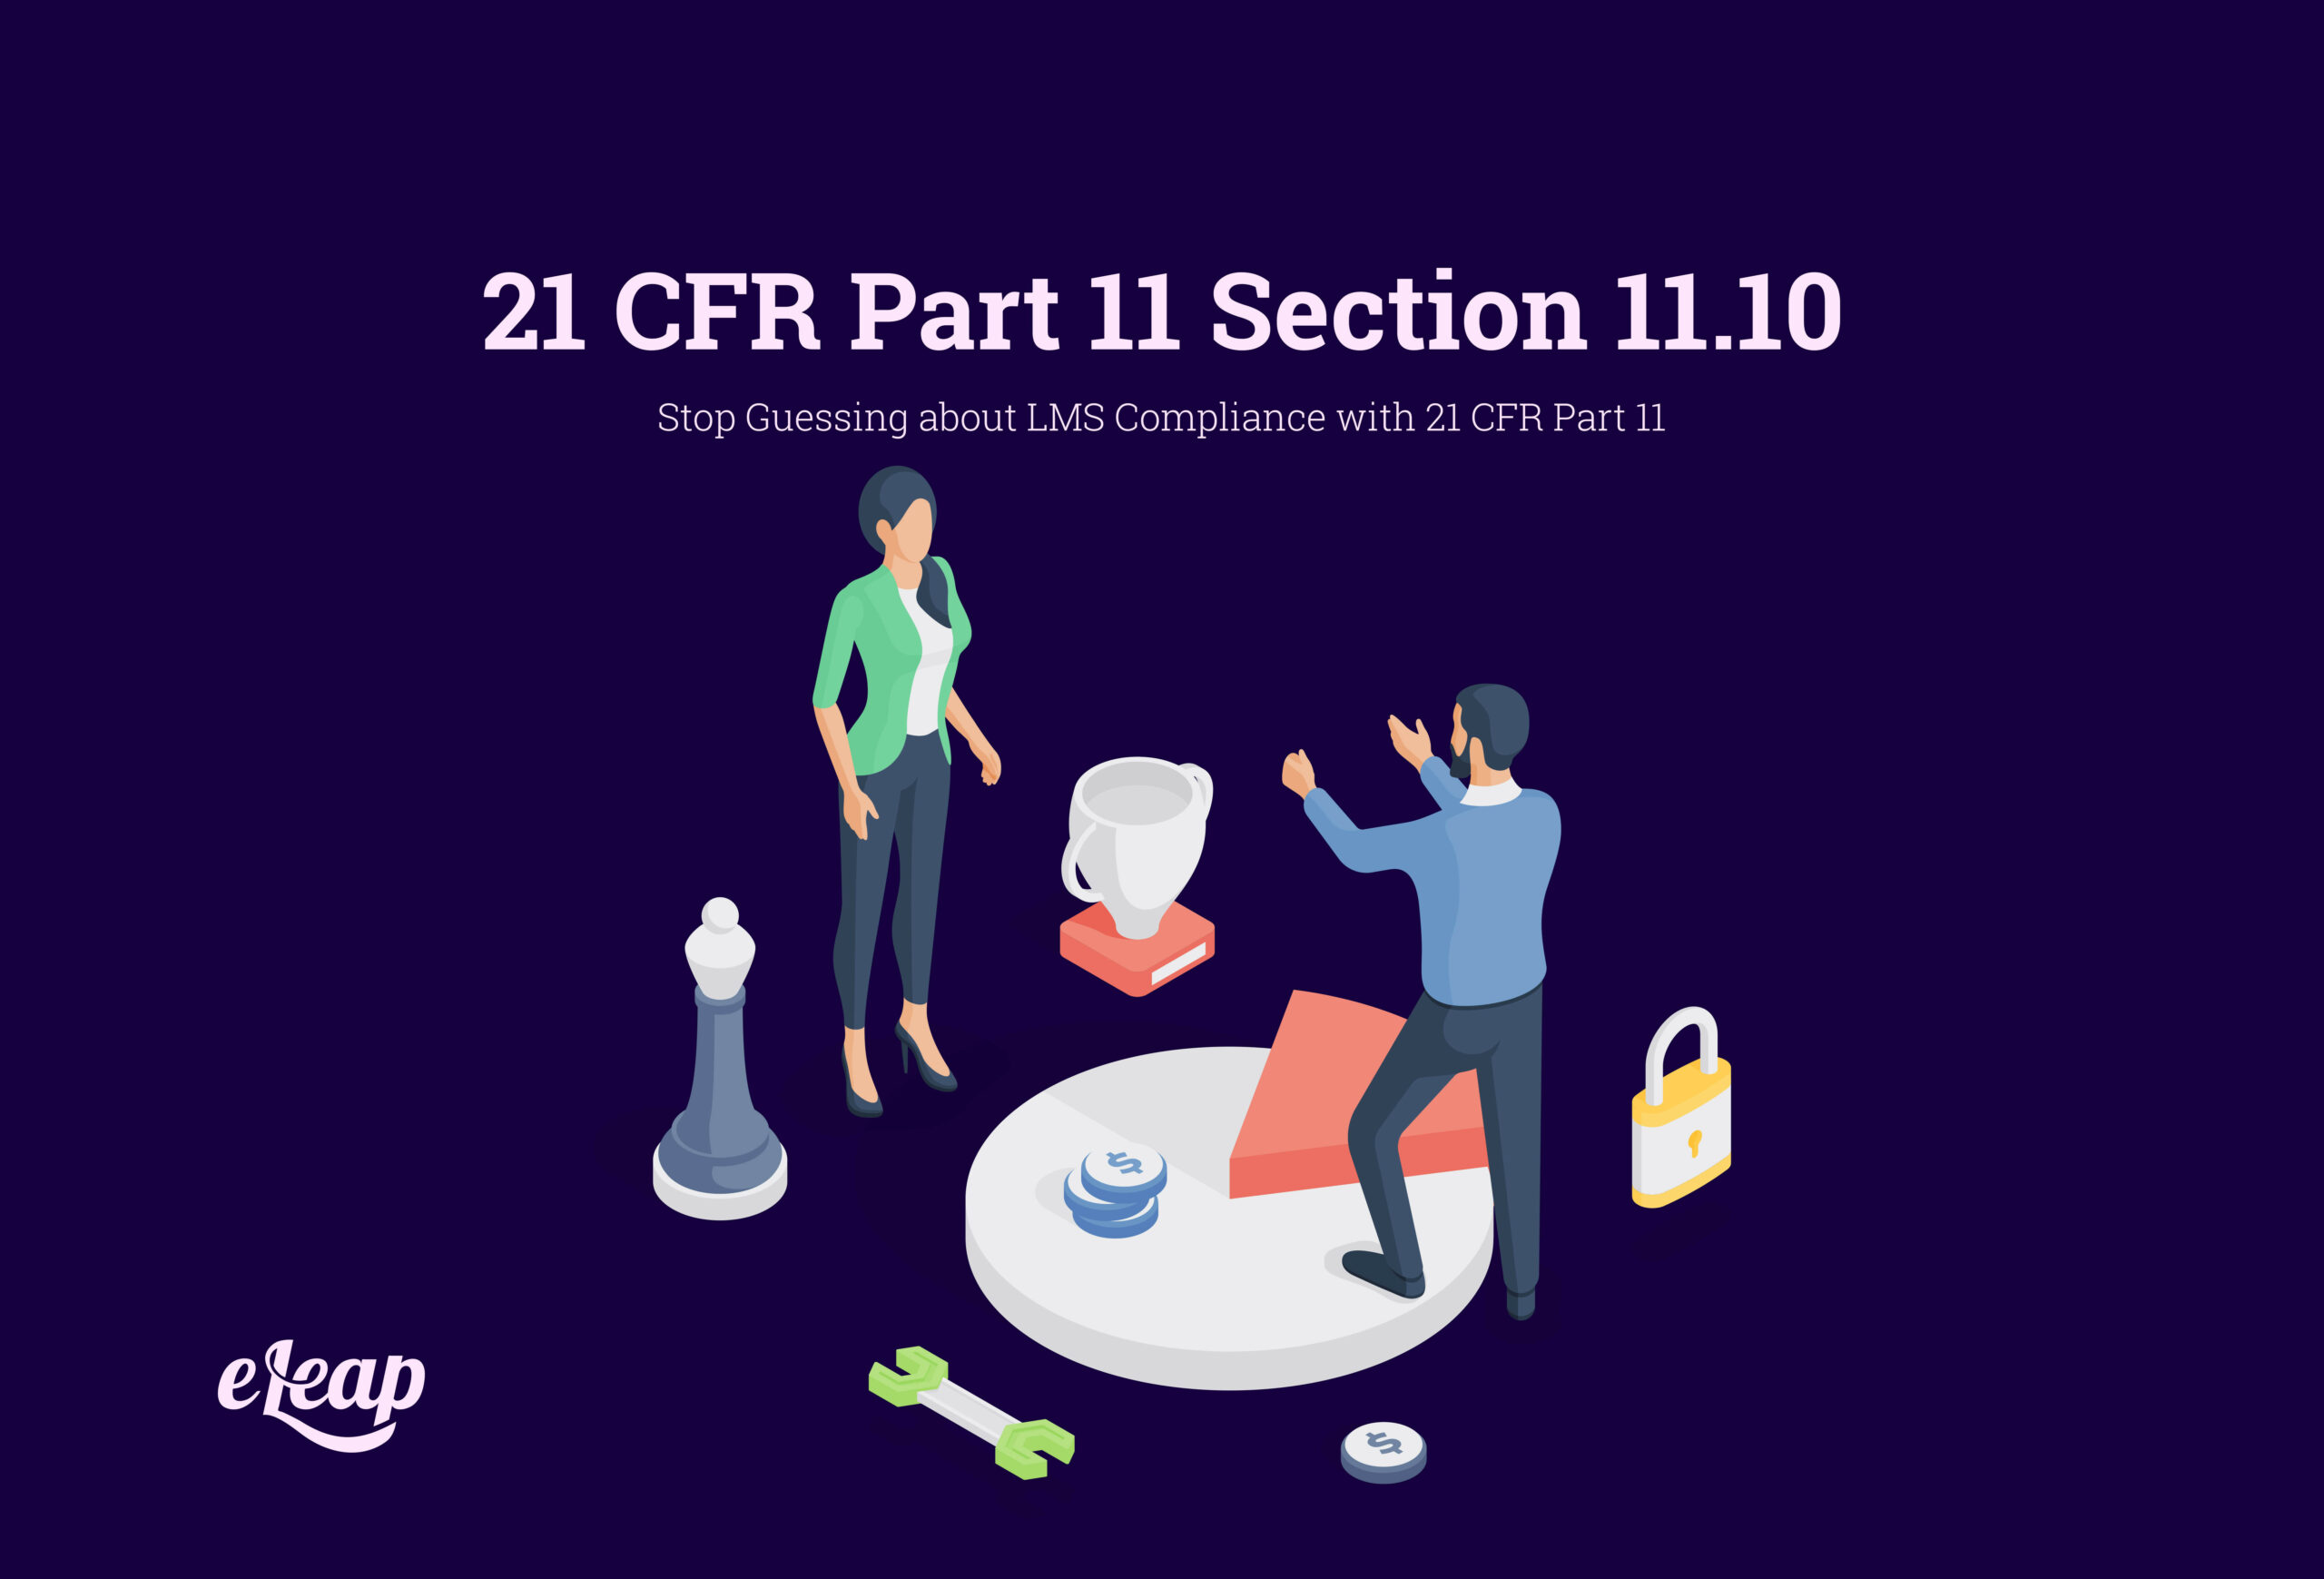 21 CFR Part 11 Section 11.10